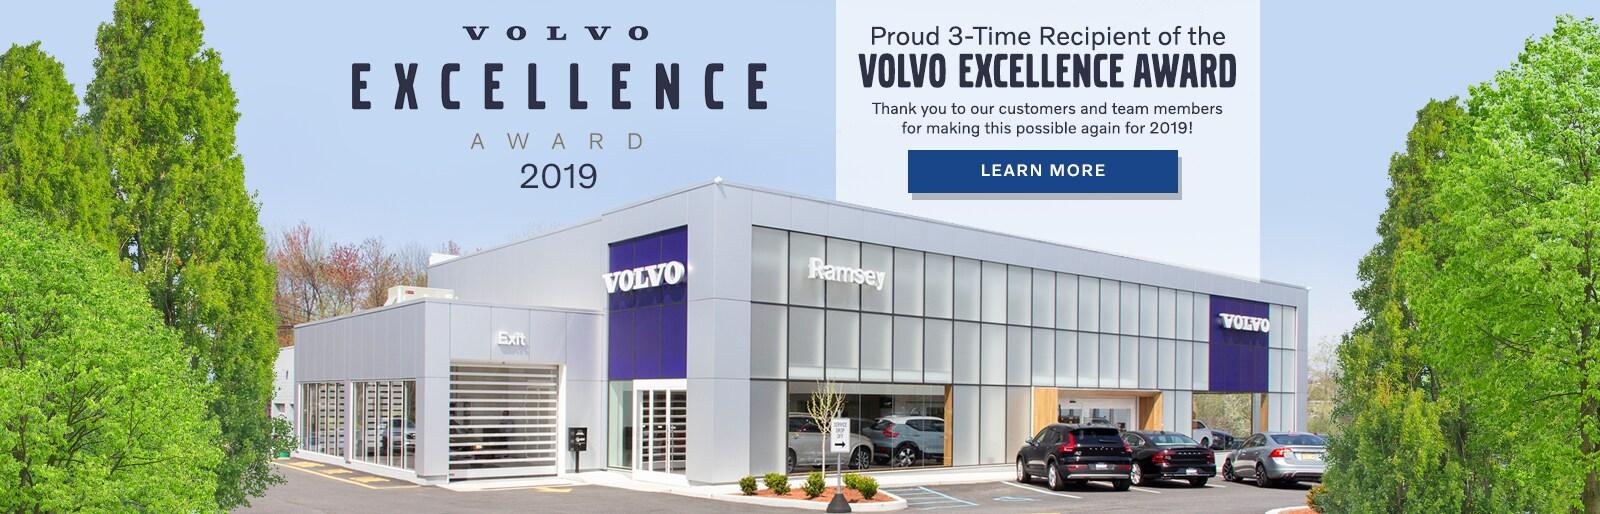 2019 Volvo Excellence Award